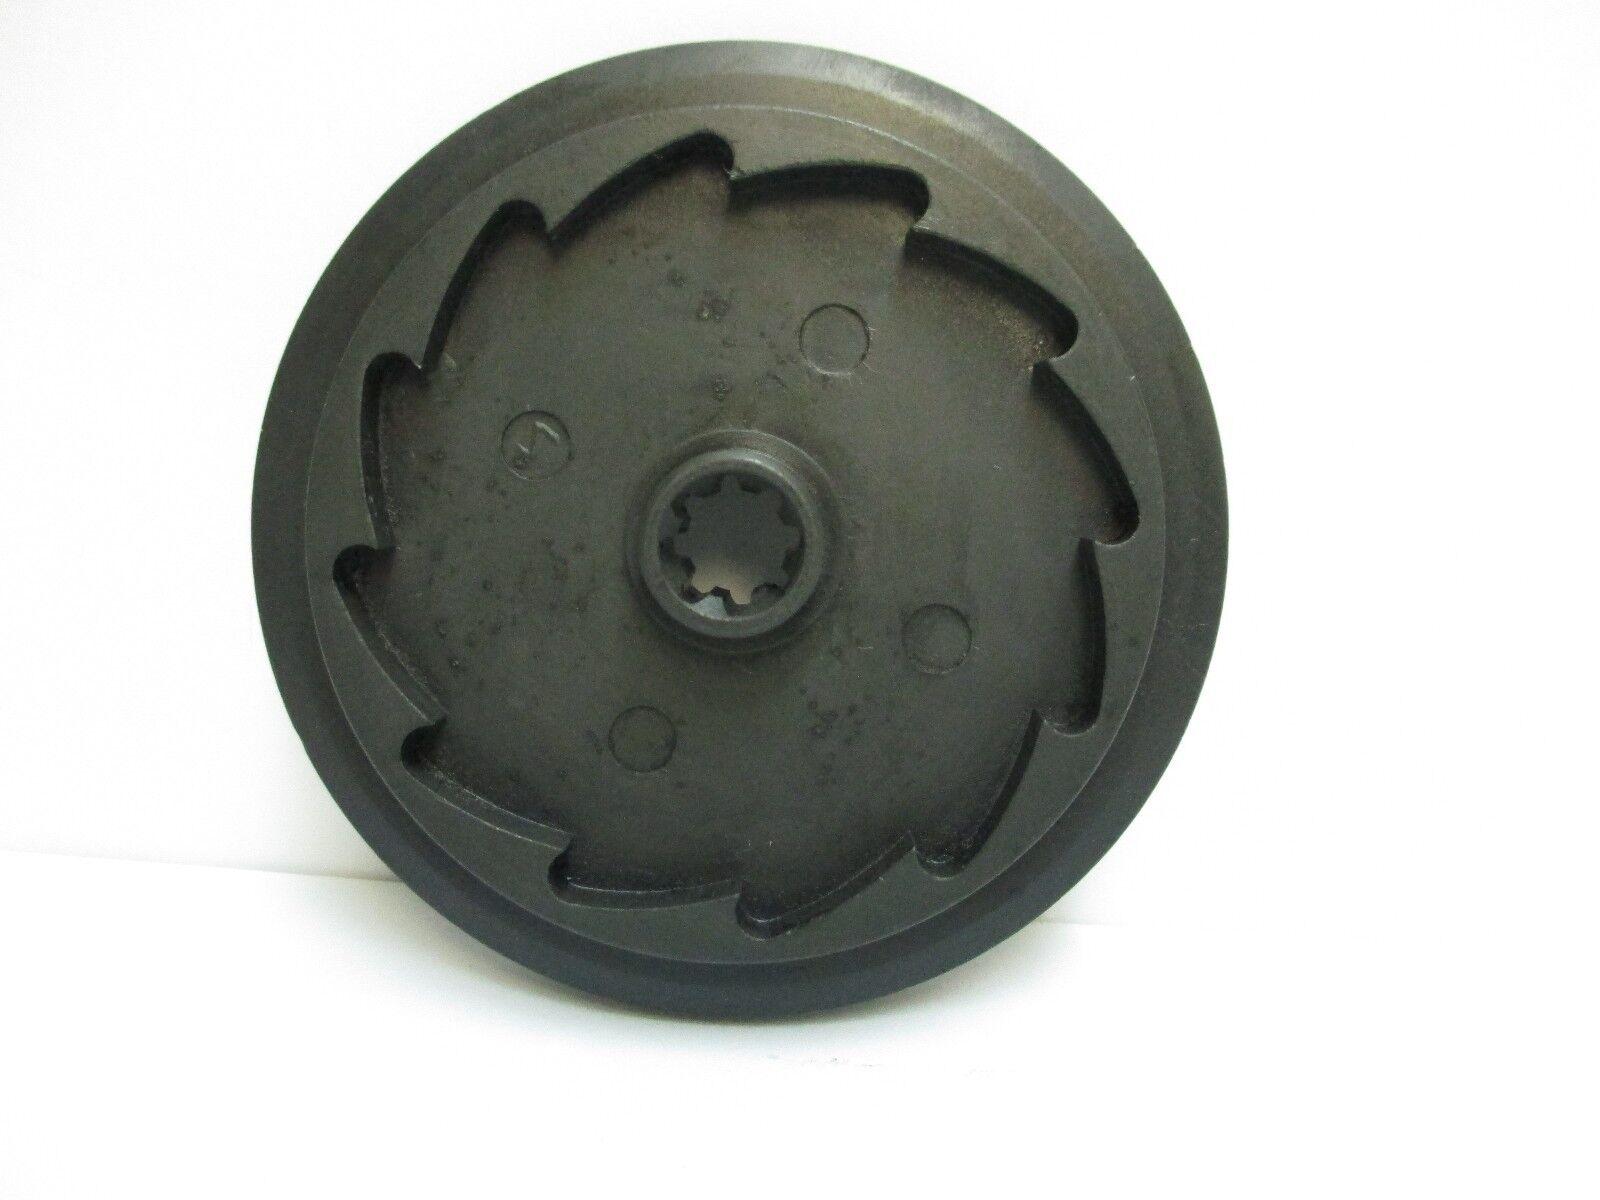 PENN REEL PART - 117DN-70 International 2 Speed 50VSW - Drive Plate Assembly